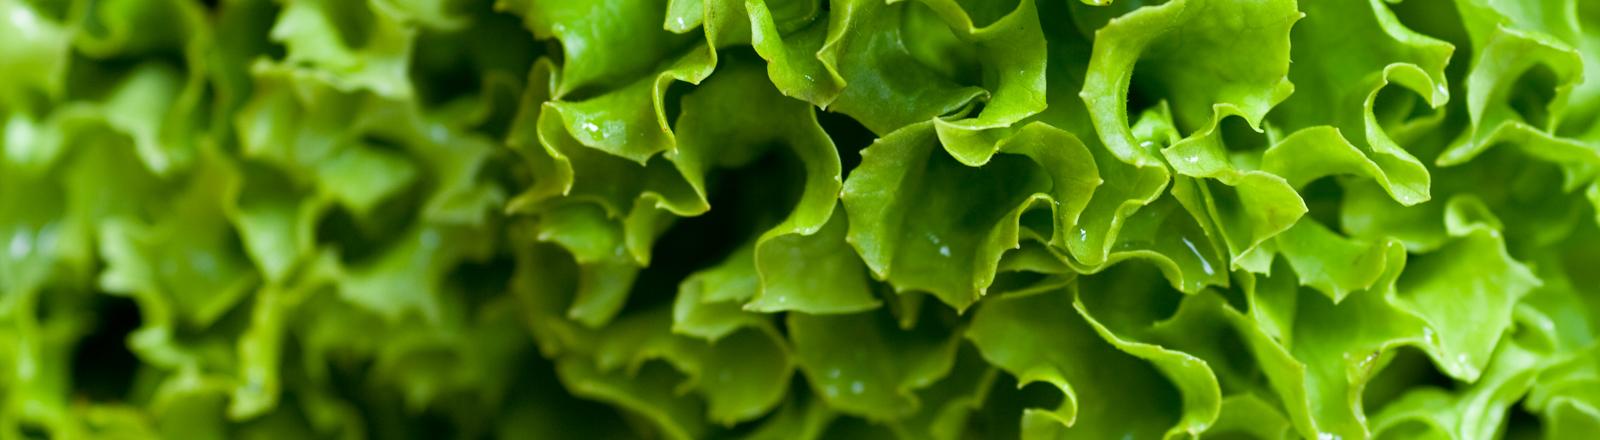 Salat. Grün, frisch, lecker, gesund.